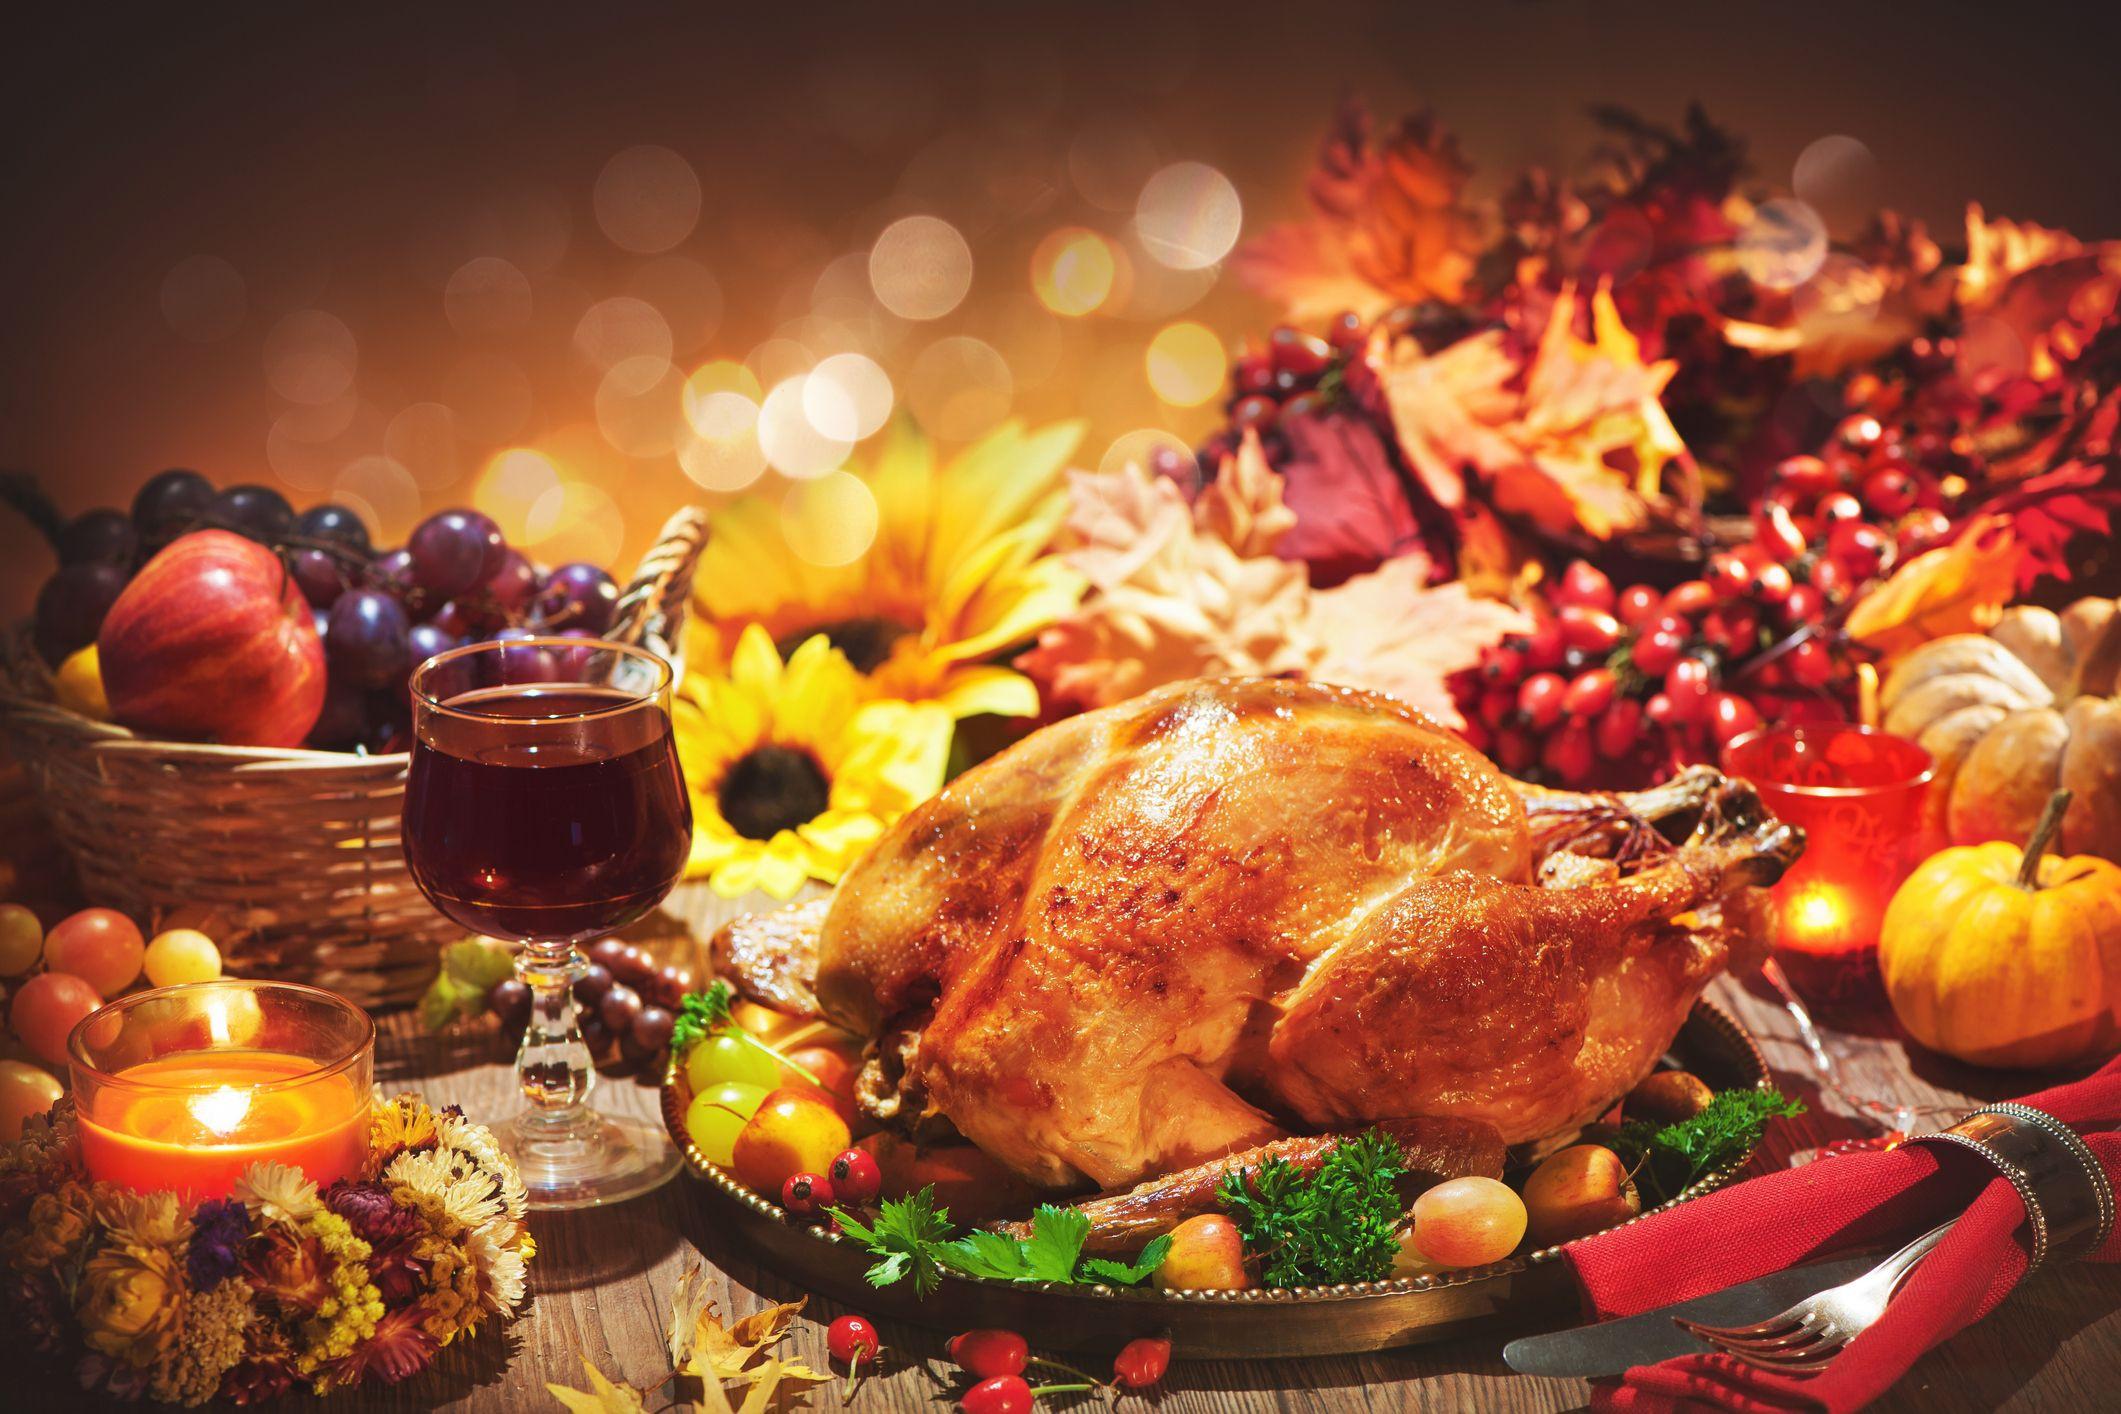 Olive Garden Thanksgiving  What Restaurants Are Open on Thanksgiving 2018 IHOP